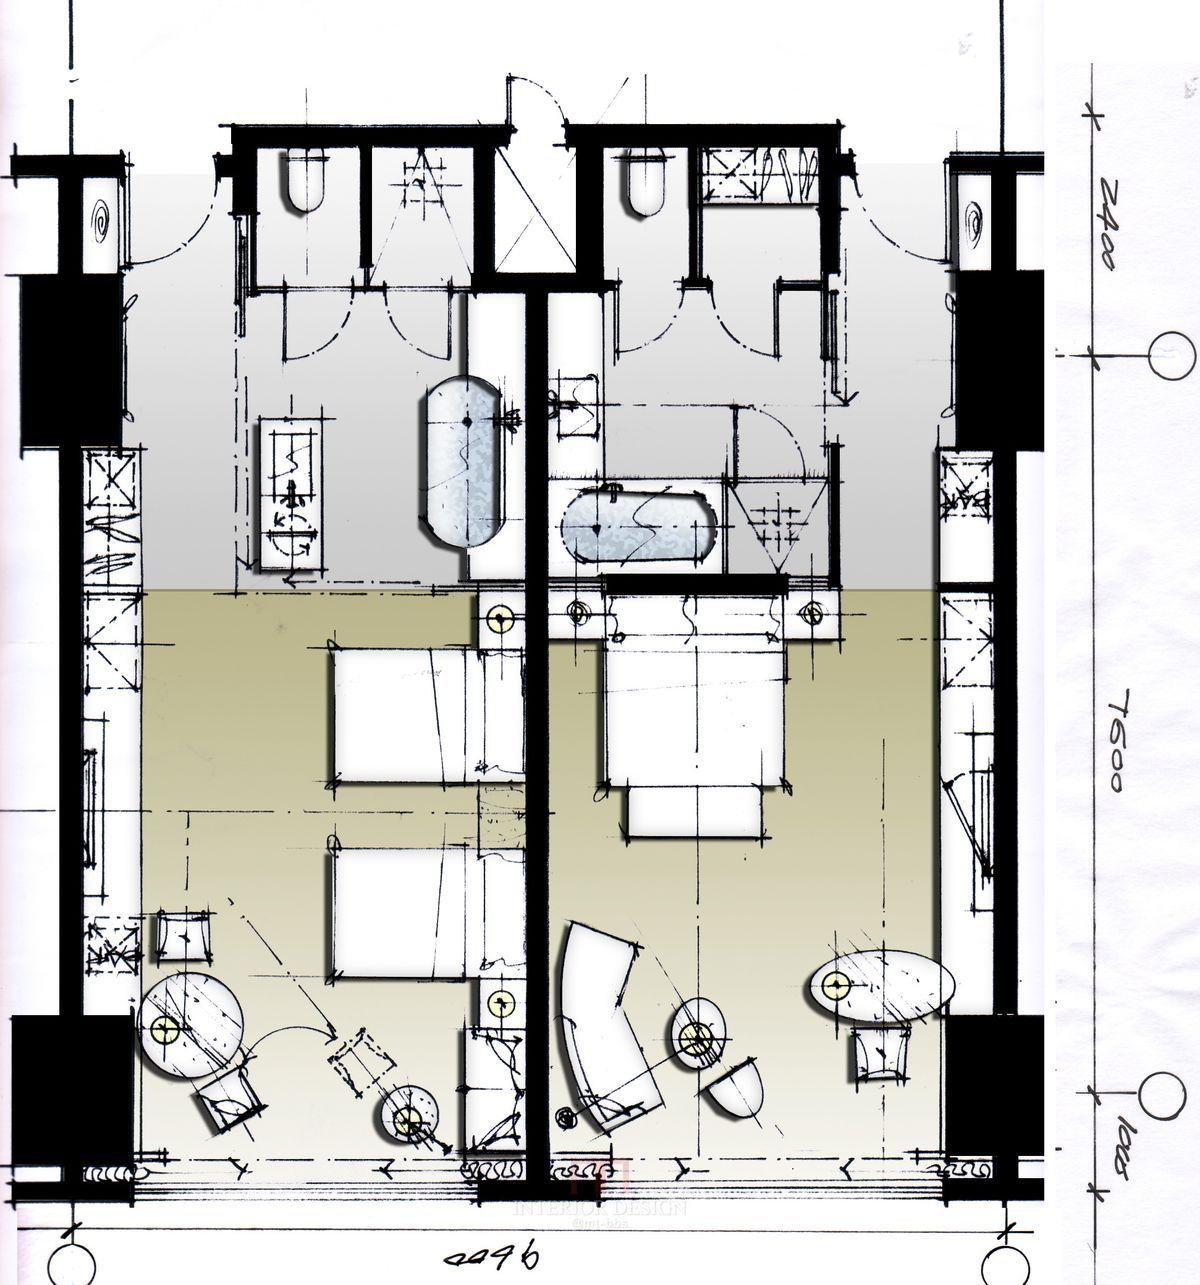 Hotel plan Hotel arquitectura, Plano hotel, Habitaciones